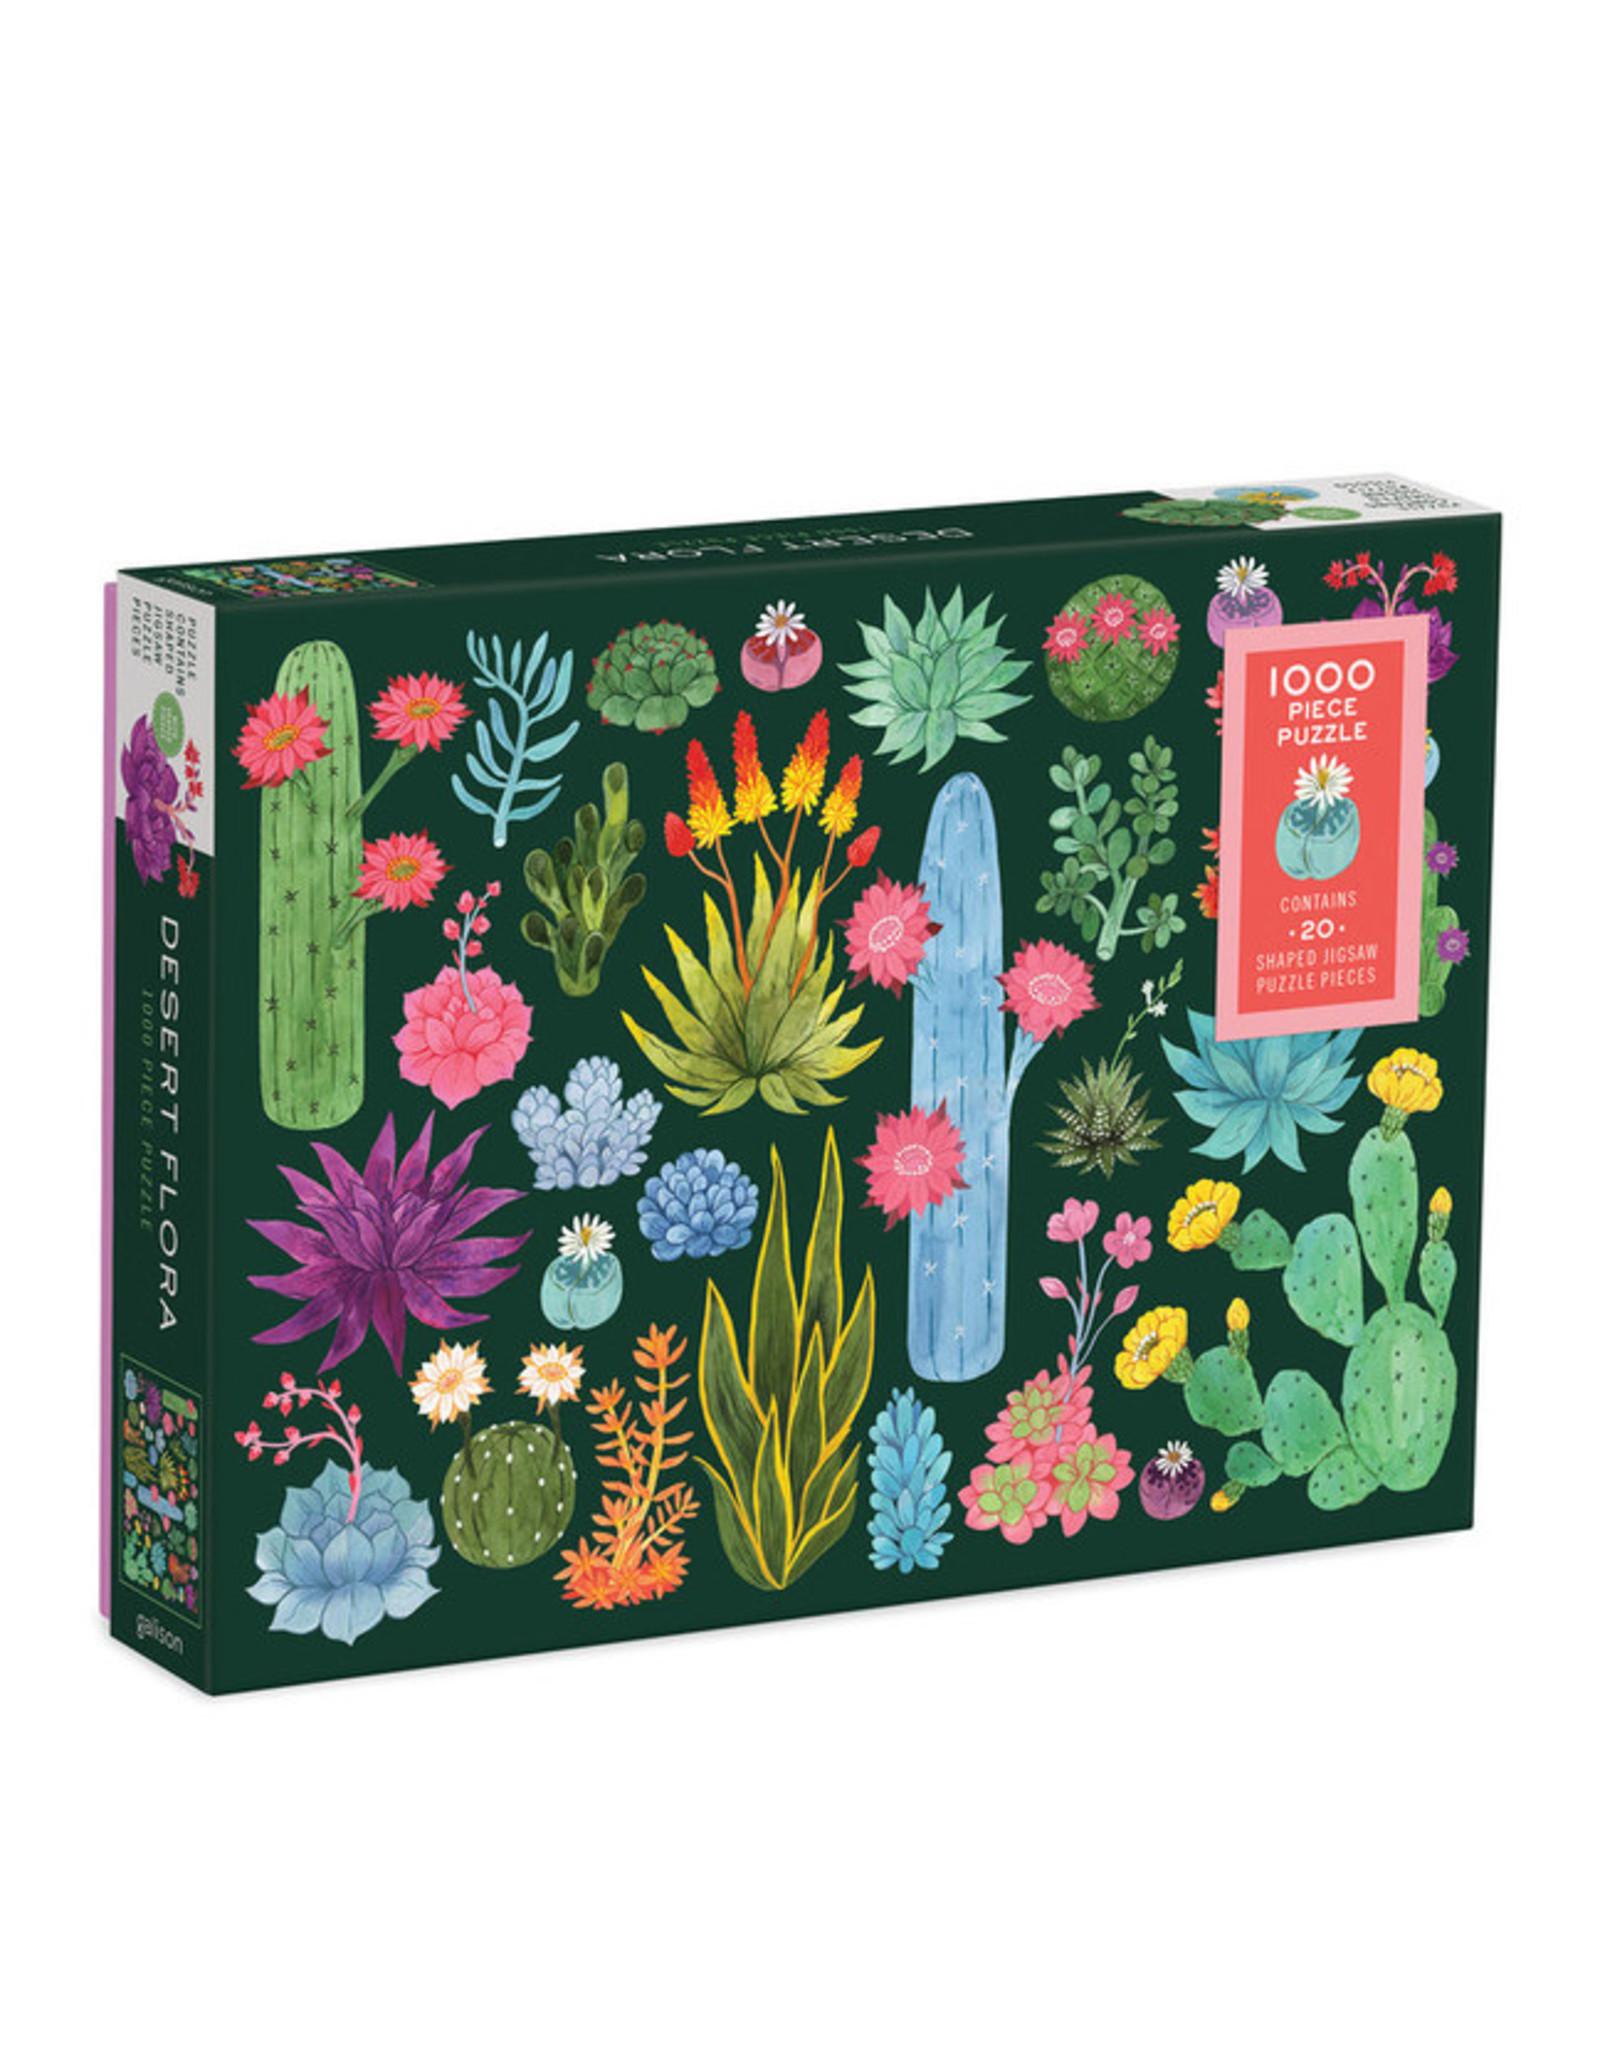 RST - Desert Flora 1000 Piece Puzzle